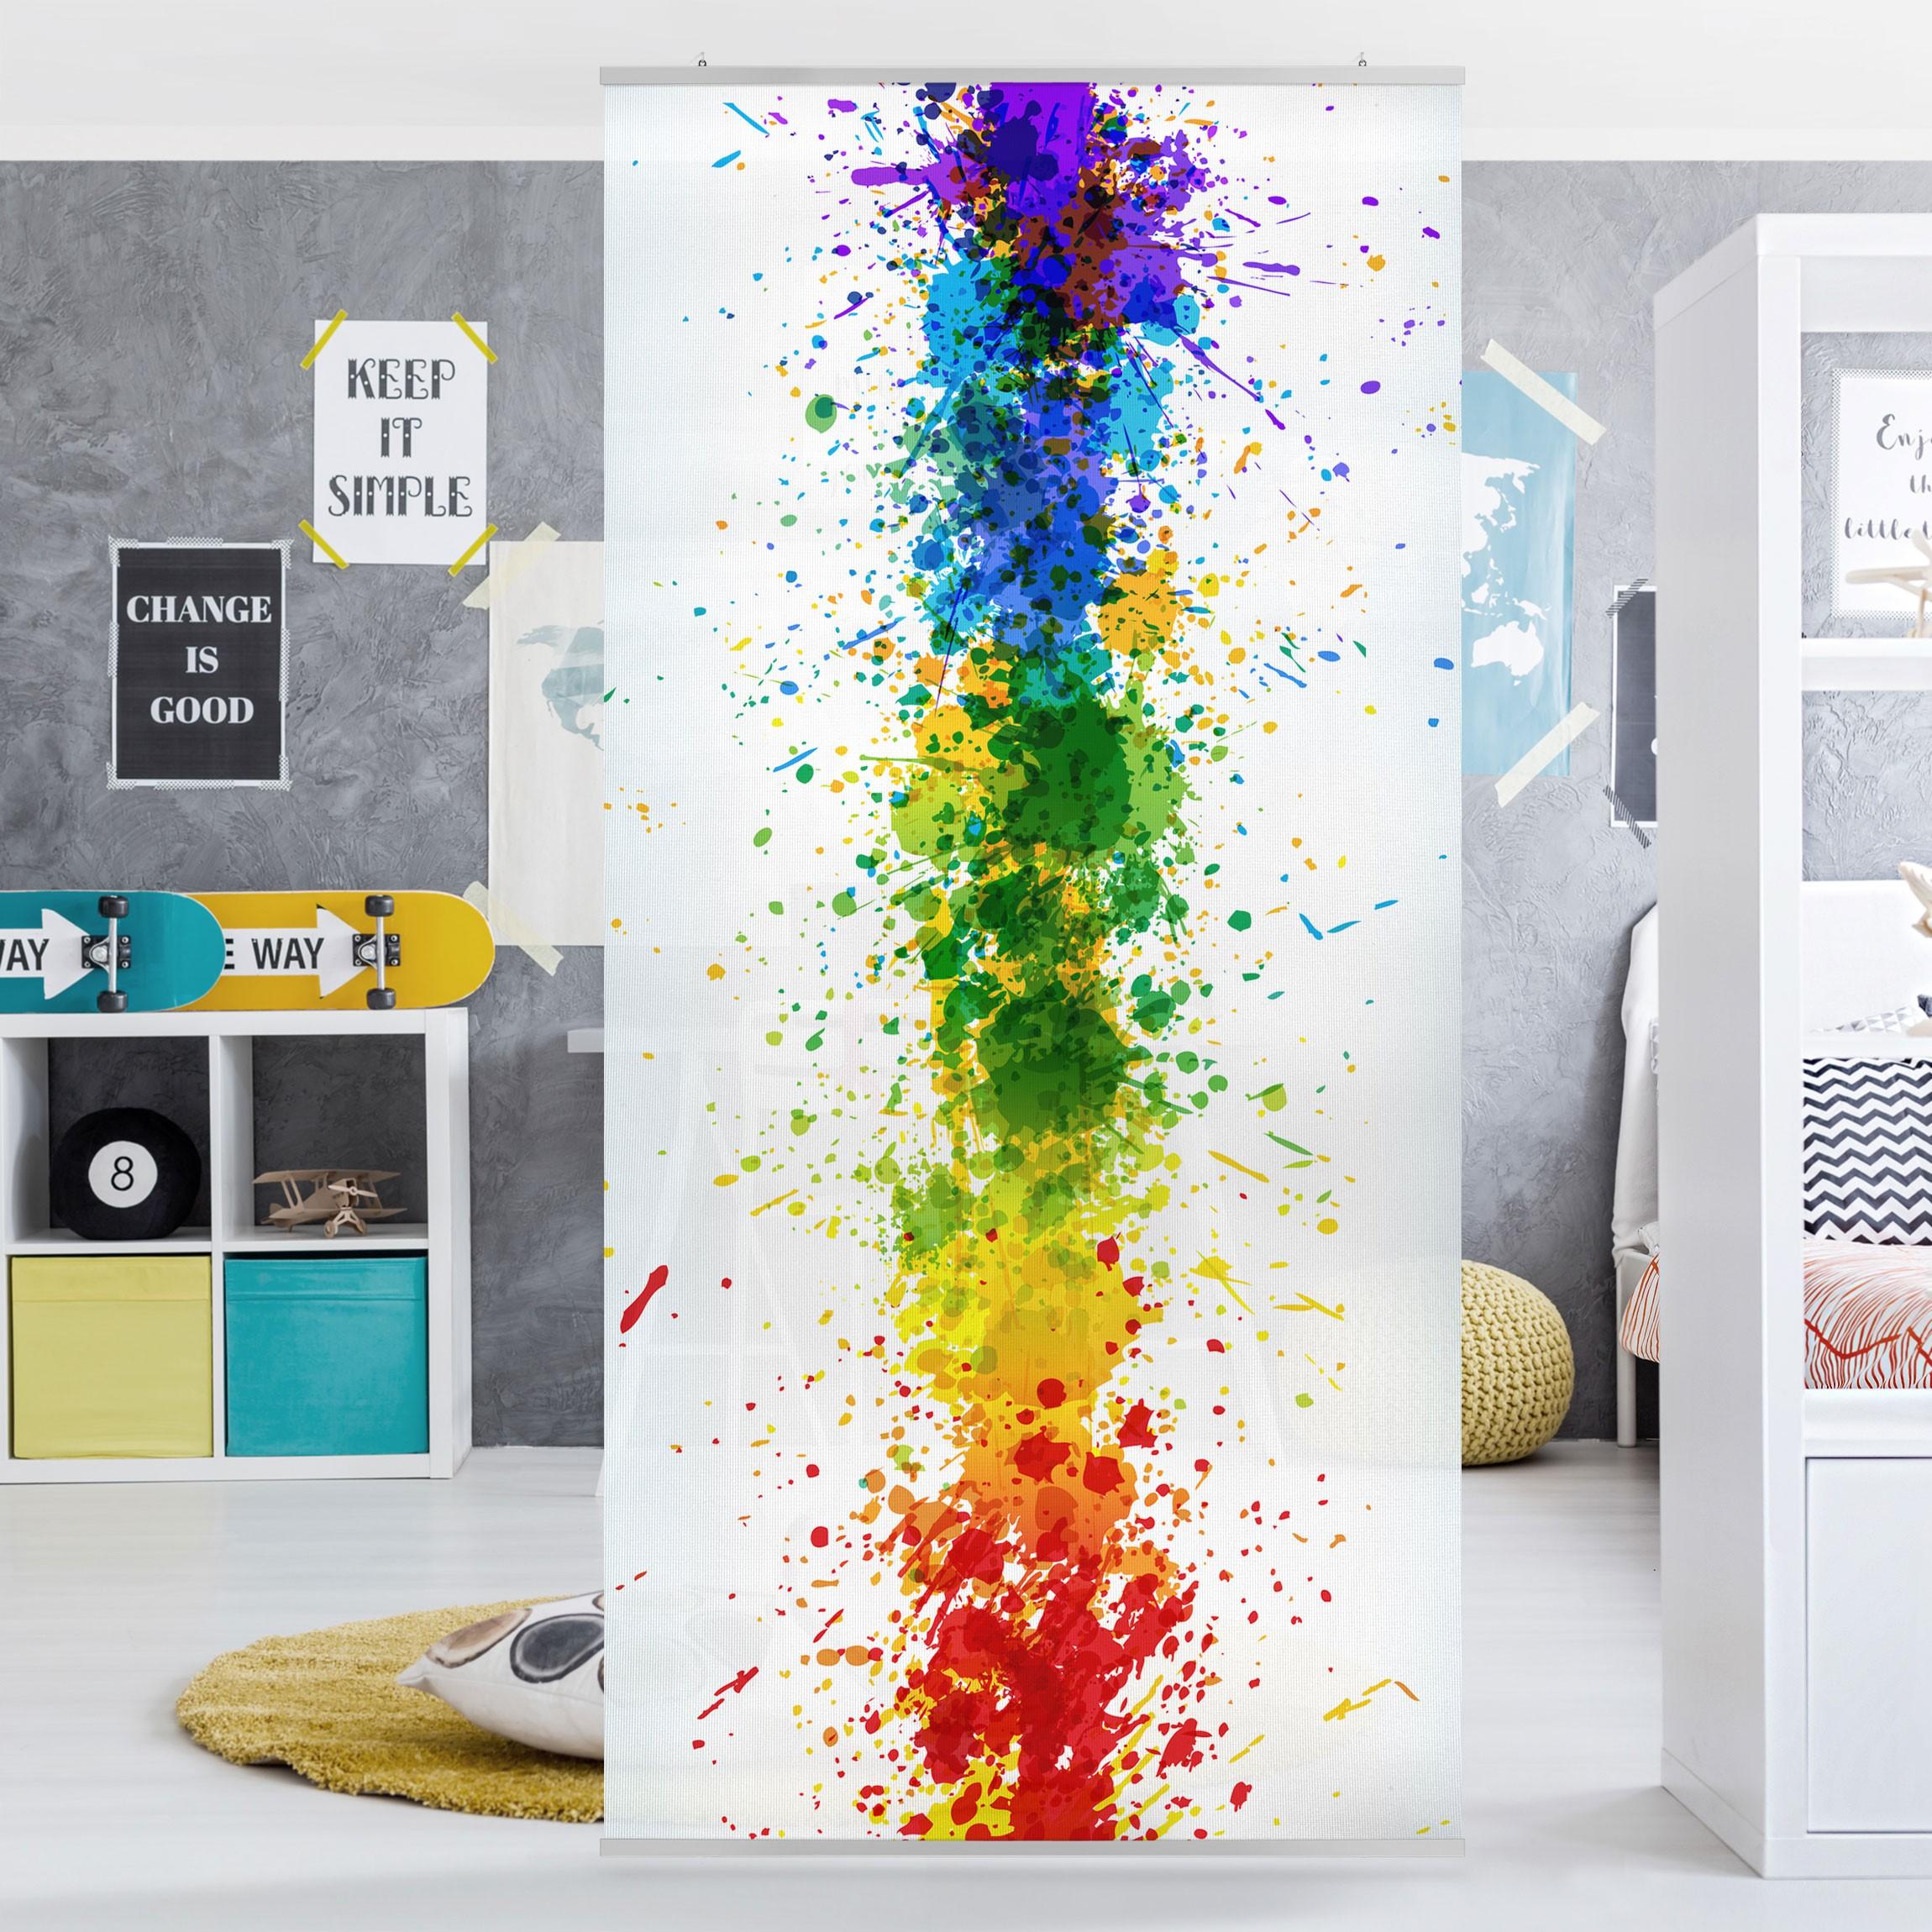 Full Size of Raumteiler Kinderzimmer Rainbow Splatter 250x120cm Regal Weiß Regale Sofa Kinderzimmer Raumteiler Kinderzimmer